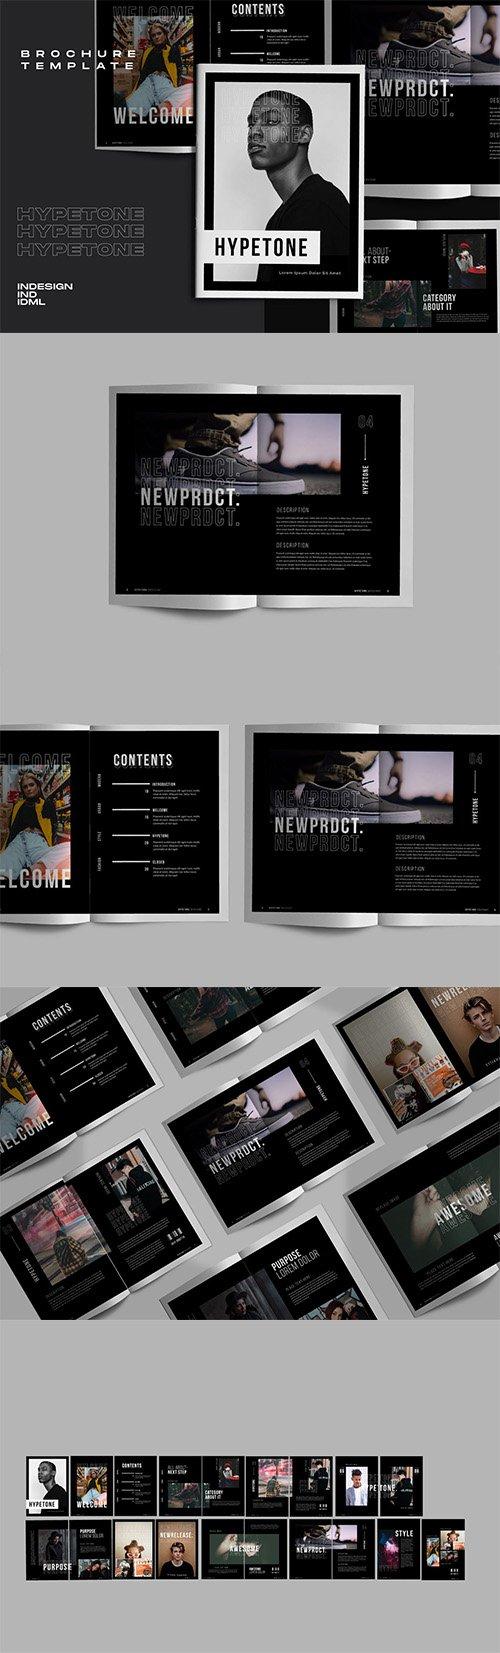 Hypetone - Creative Urban Indesign Brochure